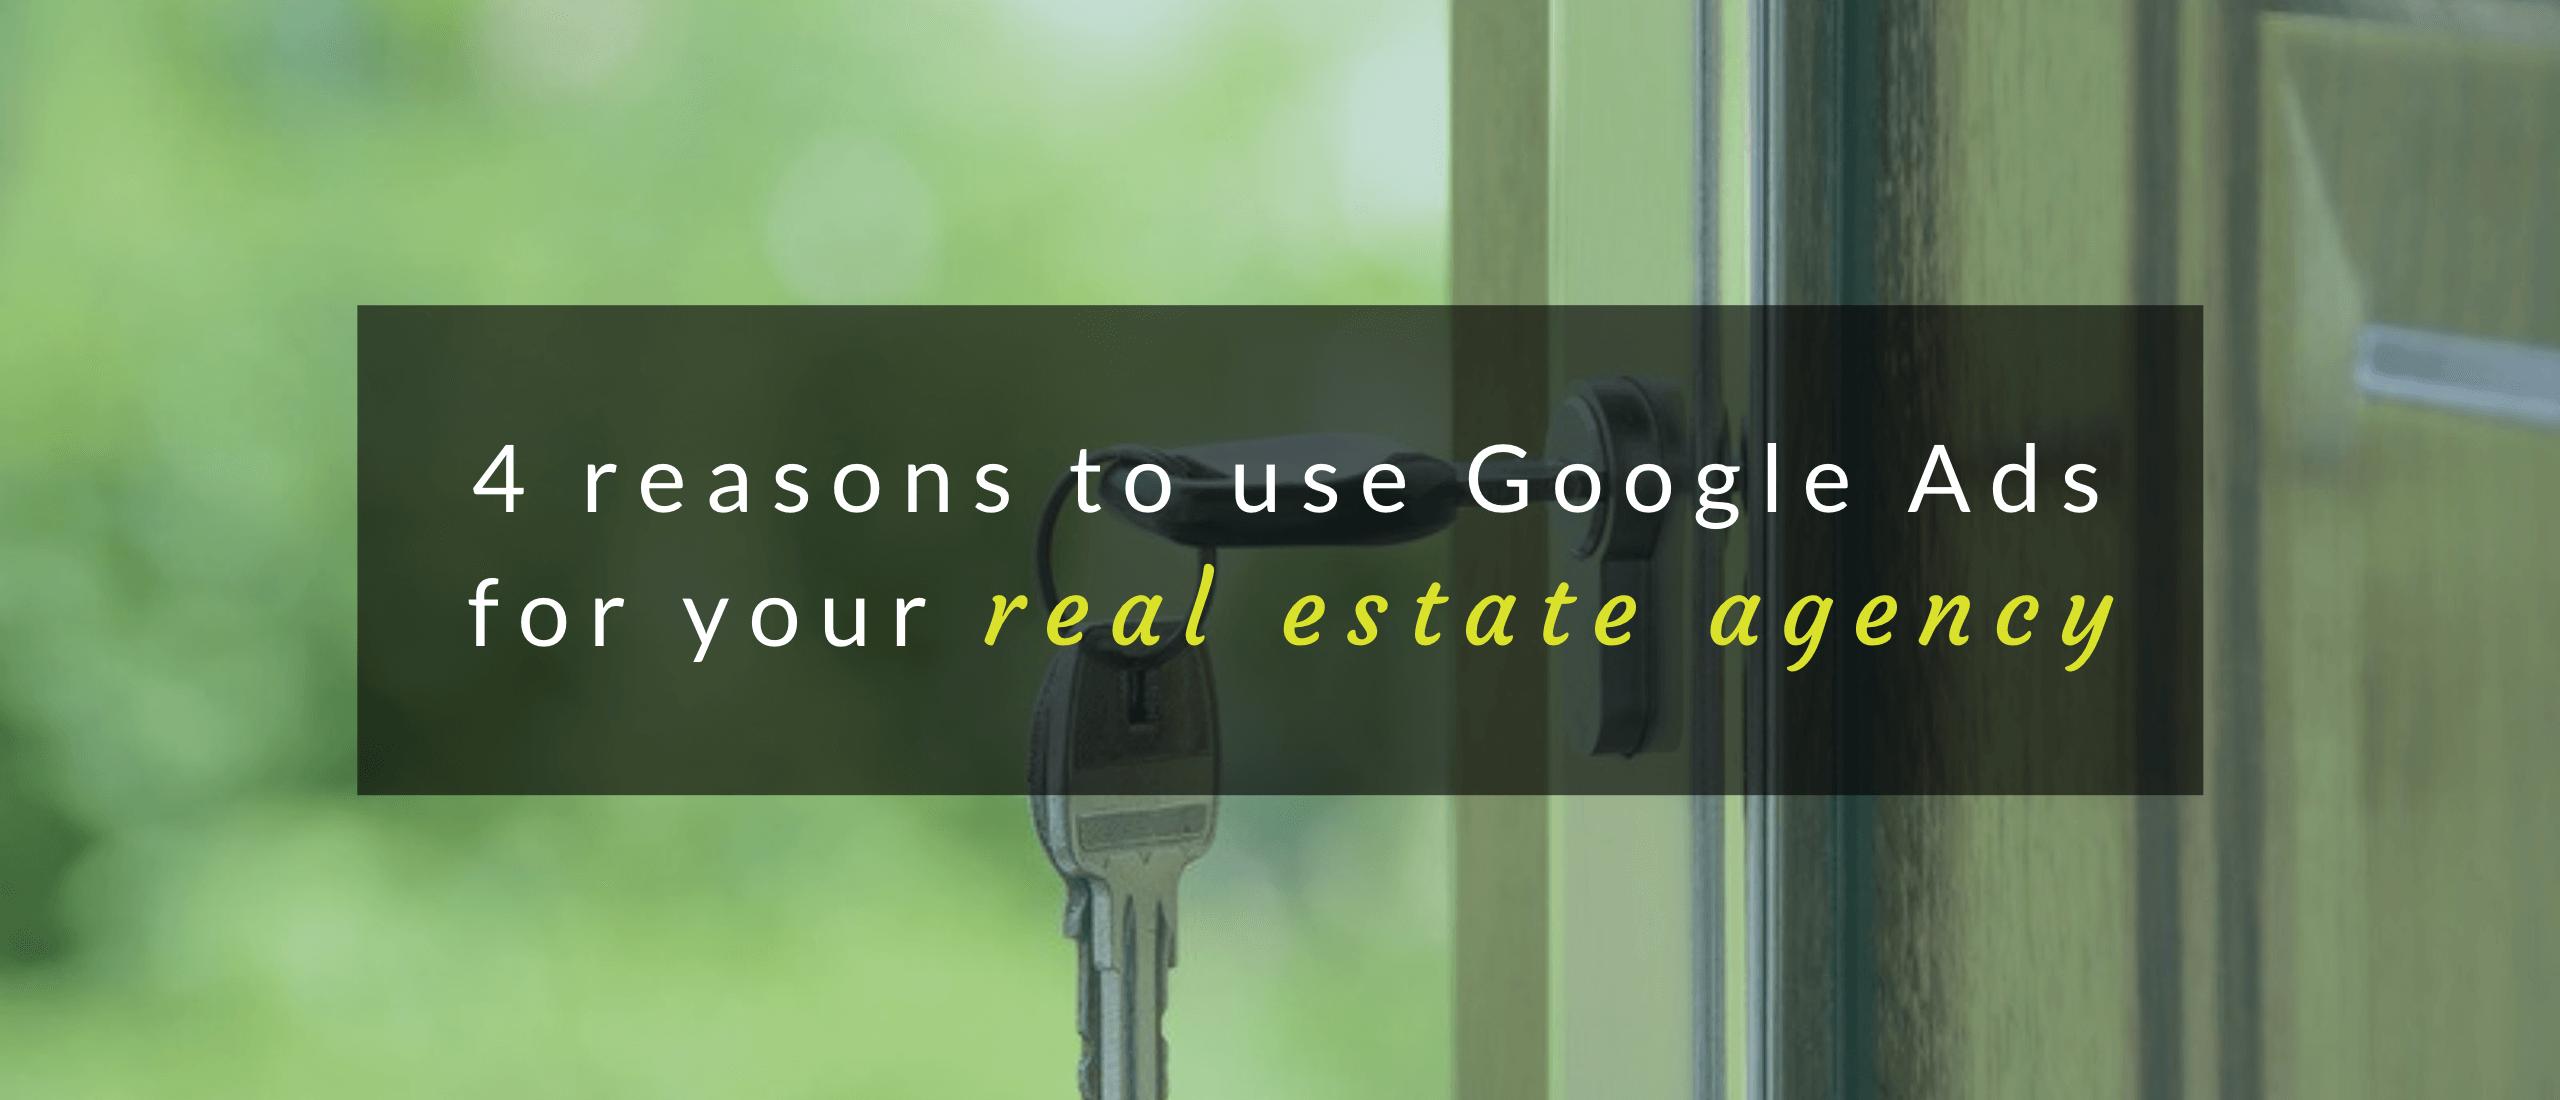 Header image of real estate agency Google Ads article.